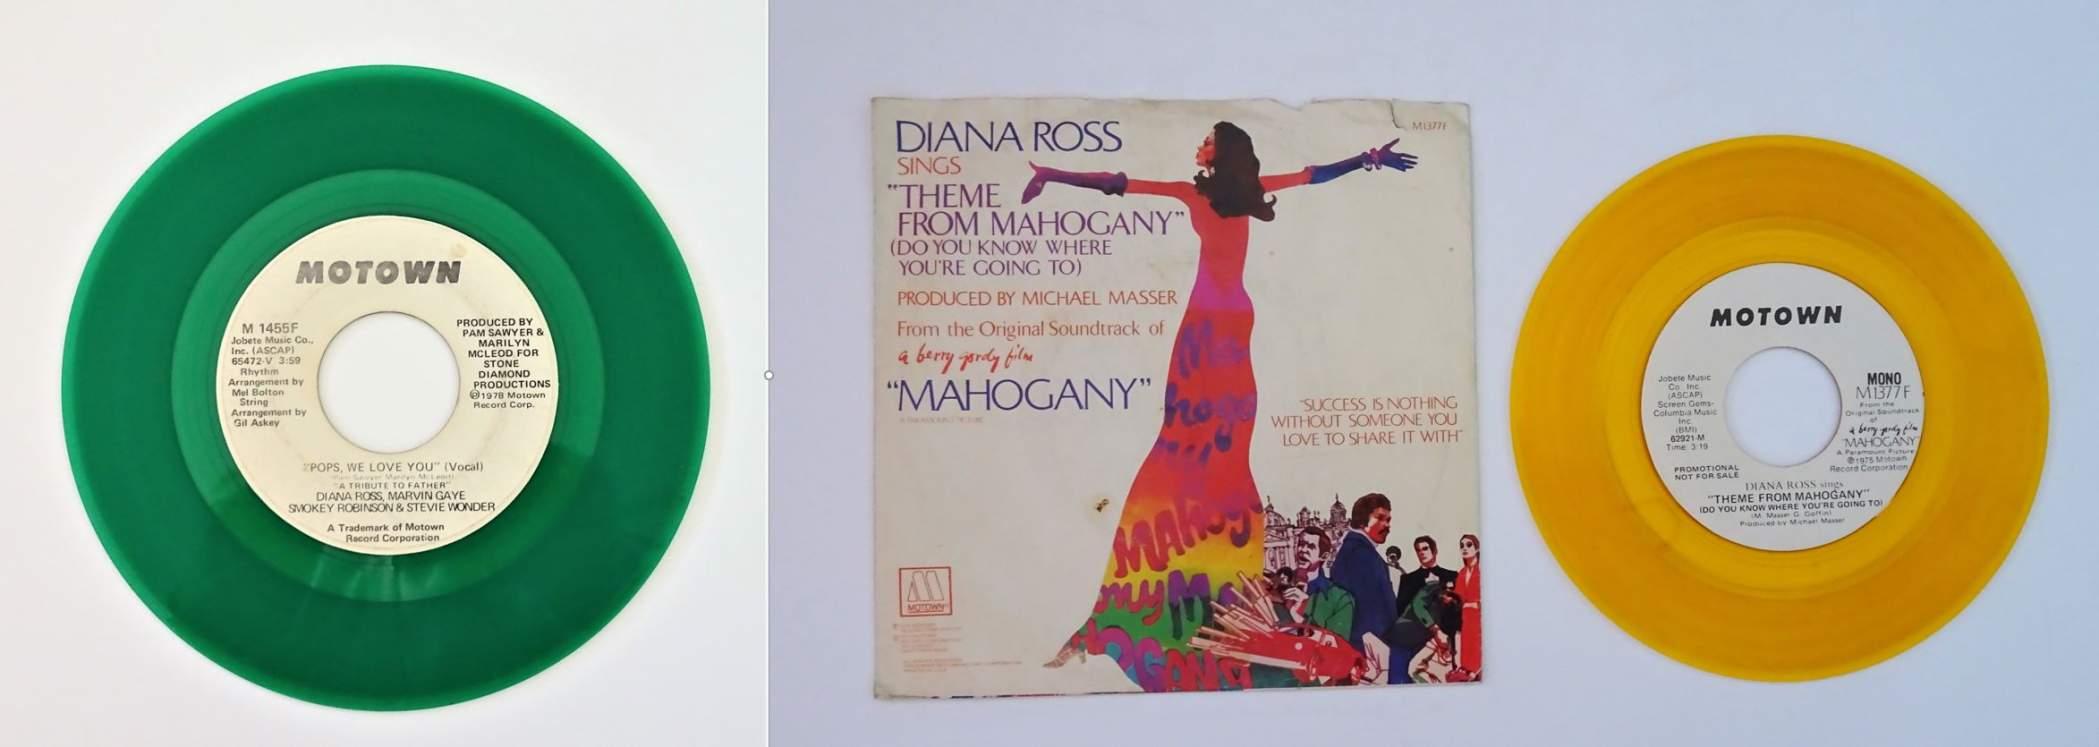 Name:  vinyl.jpg Views: 176 Size:  94.6 KB